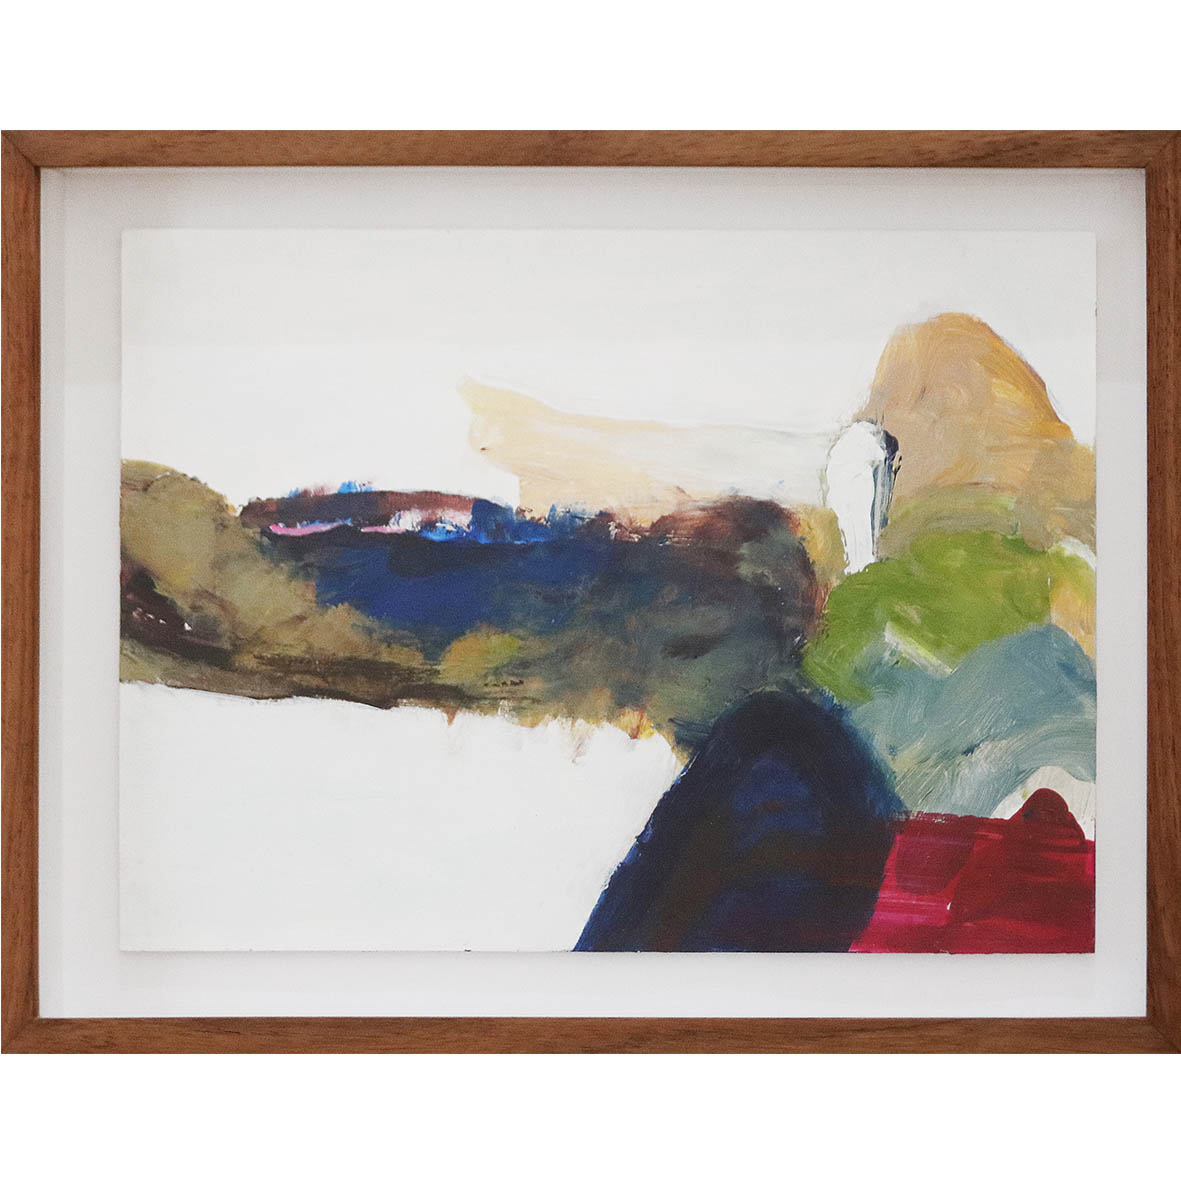 Nina Holmes Alien Terrain 2019 Acrylic on paper 36 x 27 cm